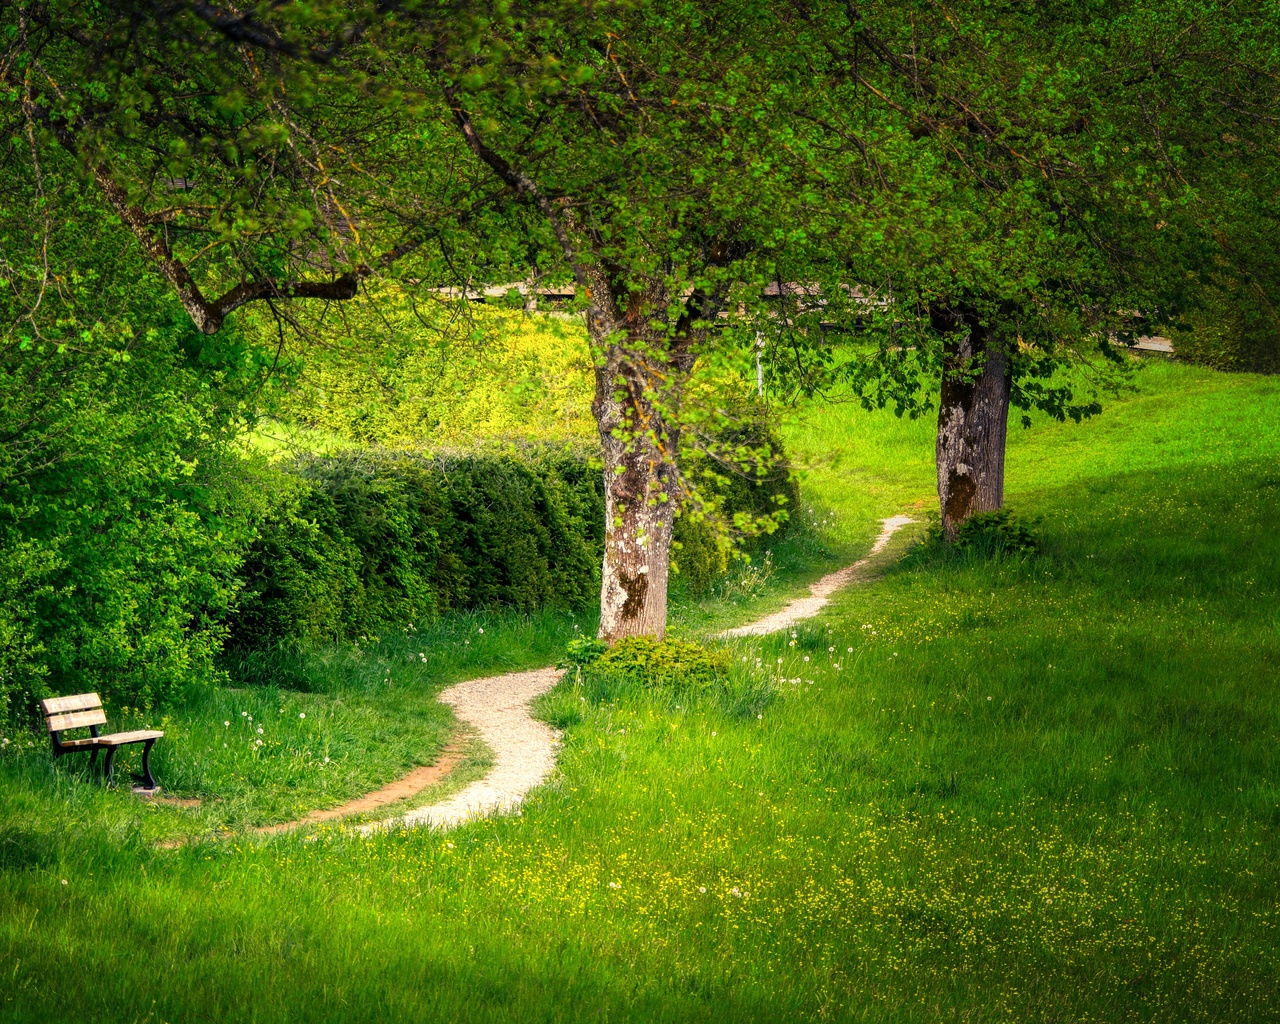 парк, скамейка, тропинка, трава